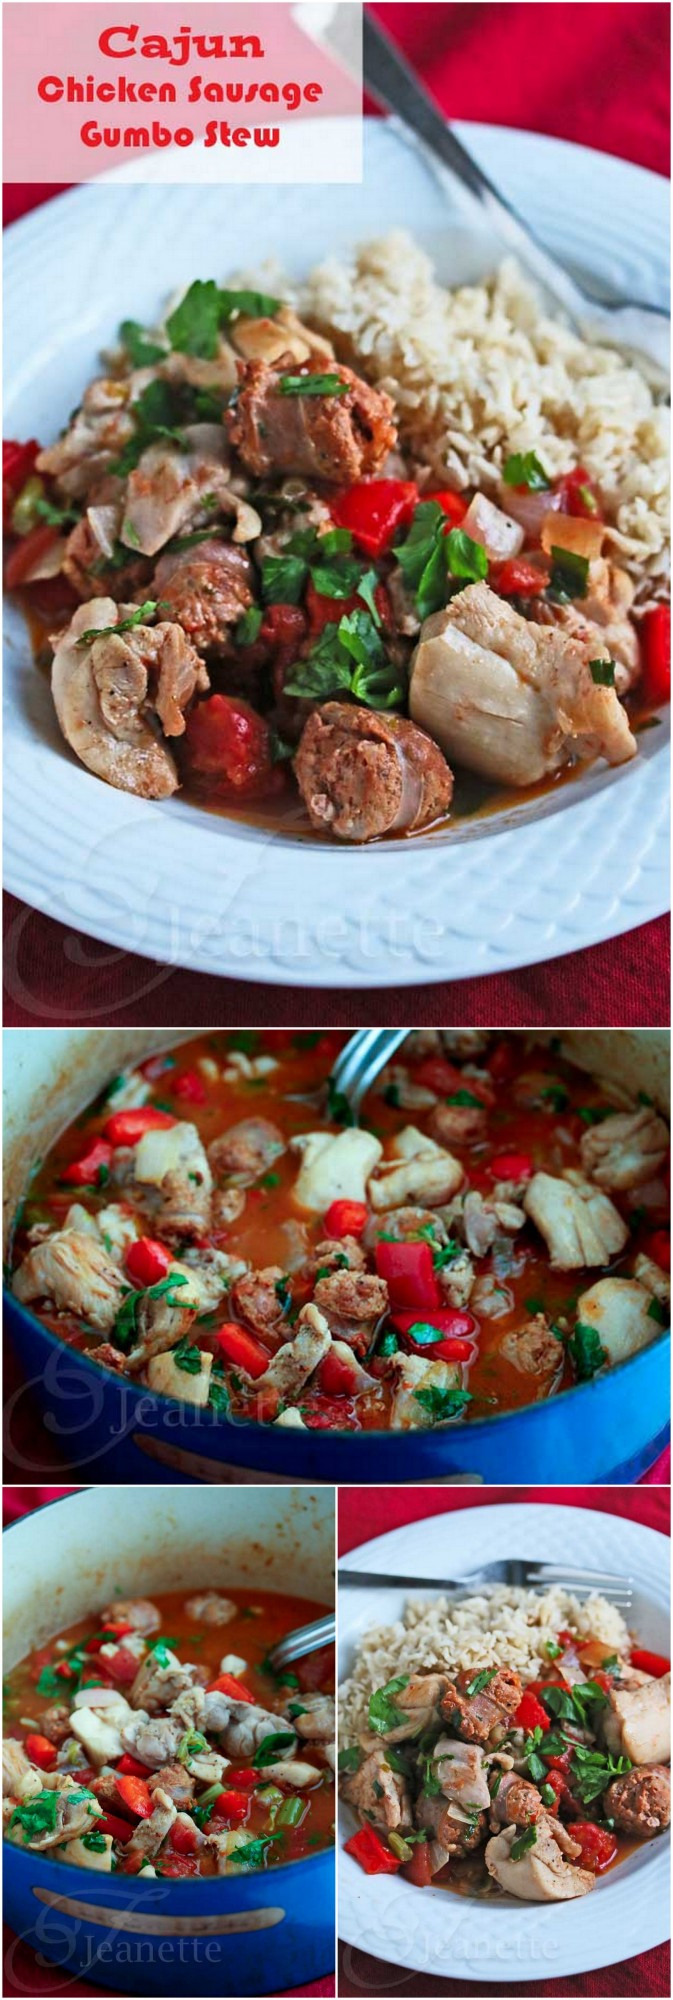 Cajun Chicken Sausage Gumbo Stew